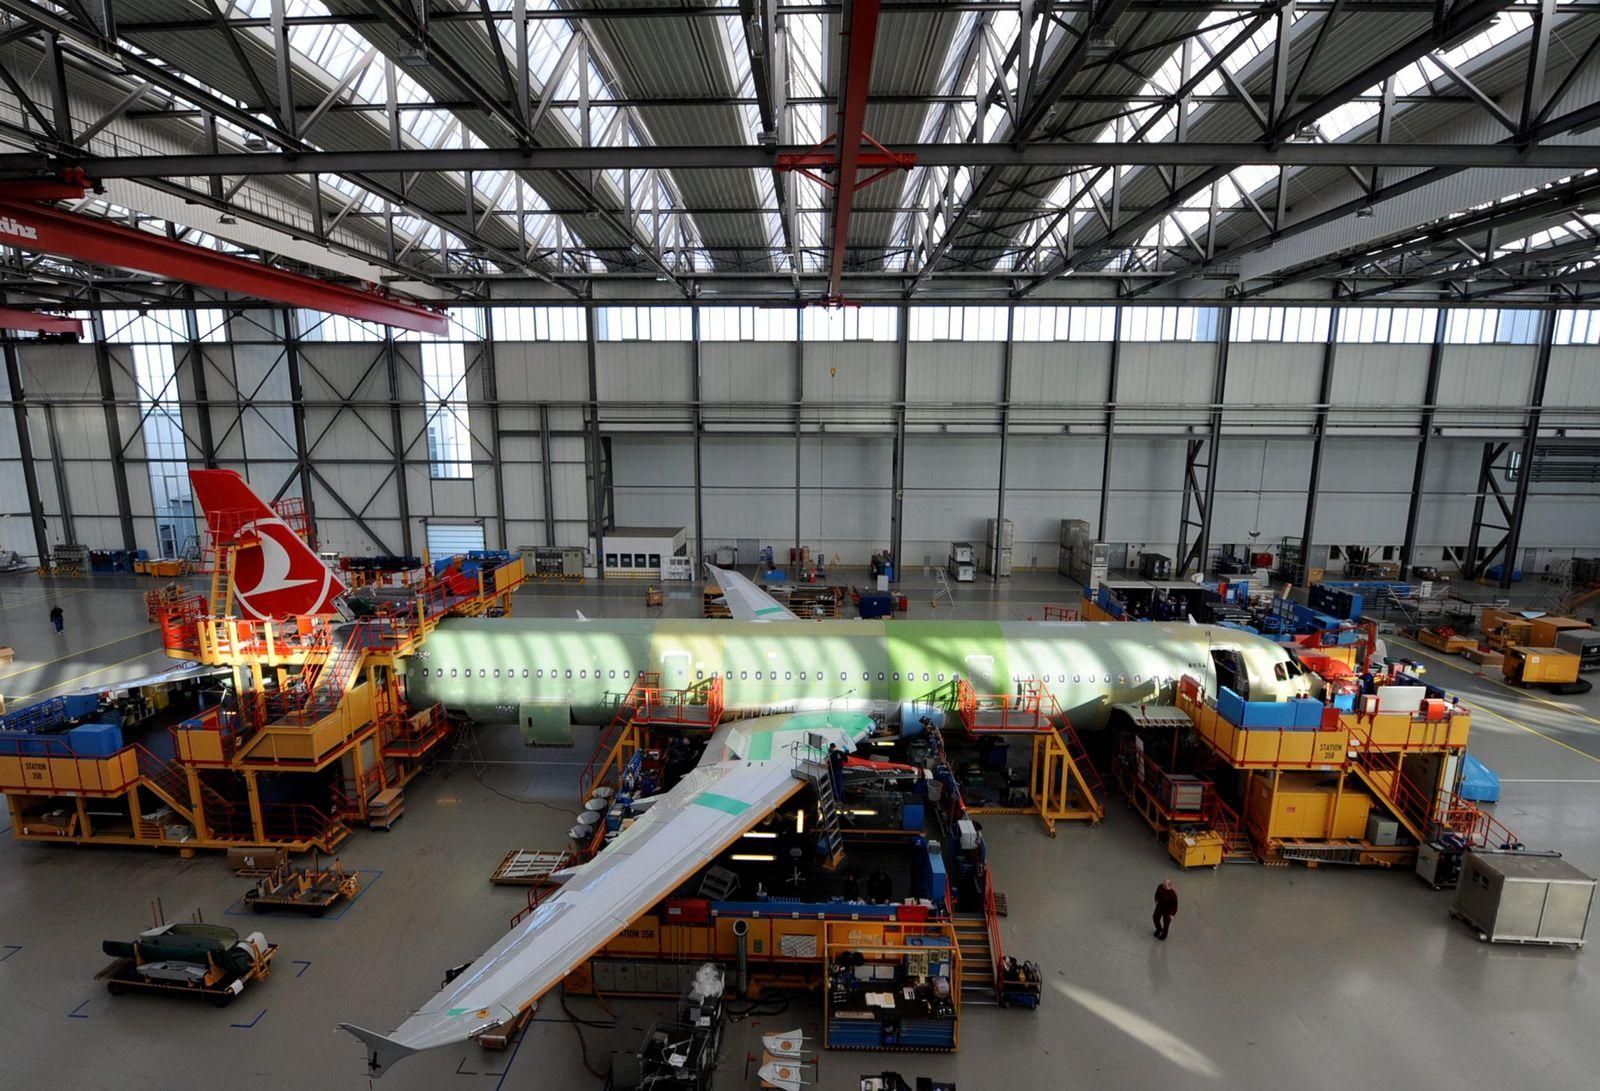 Airbus Fertigung in Hamburg